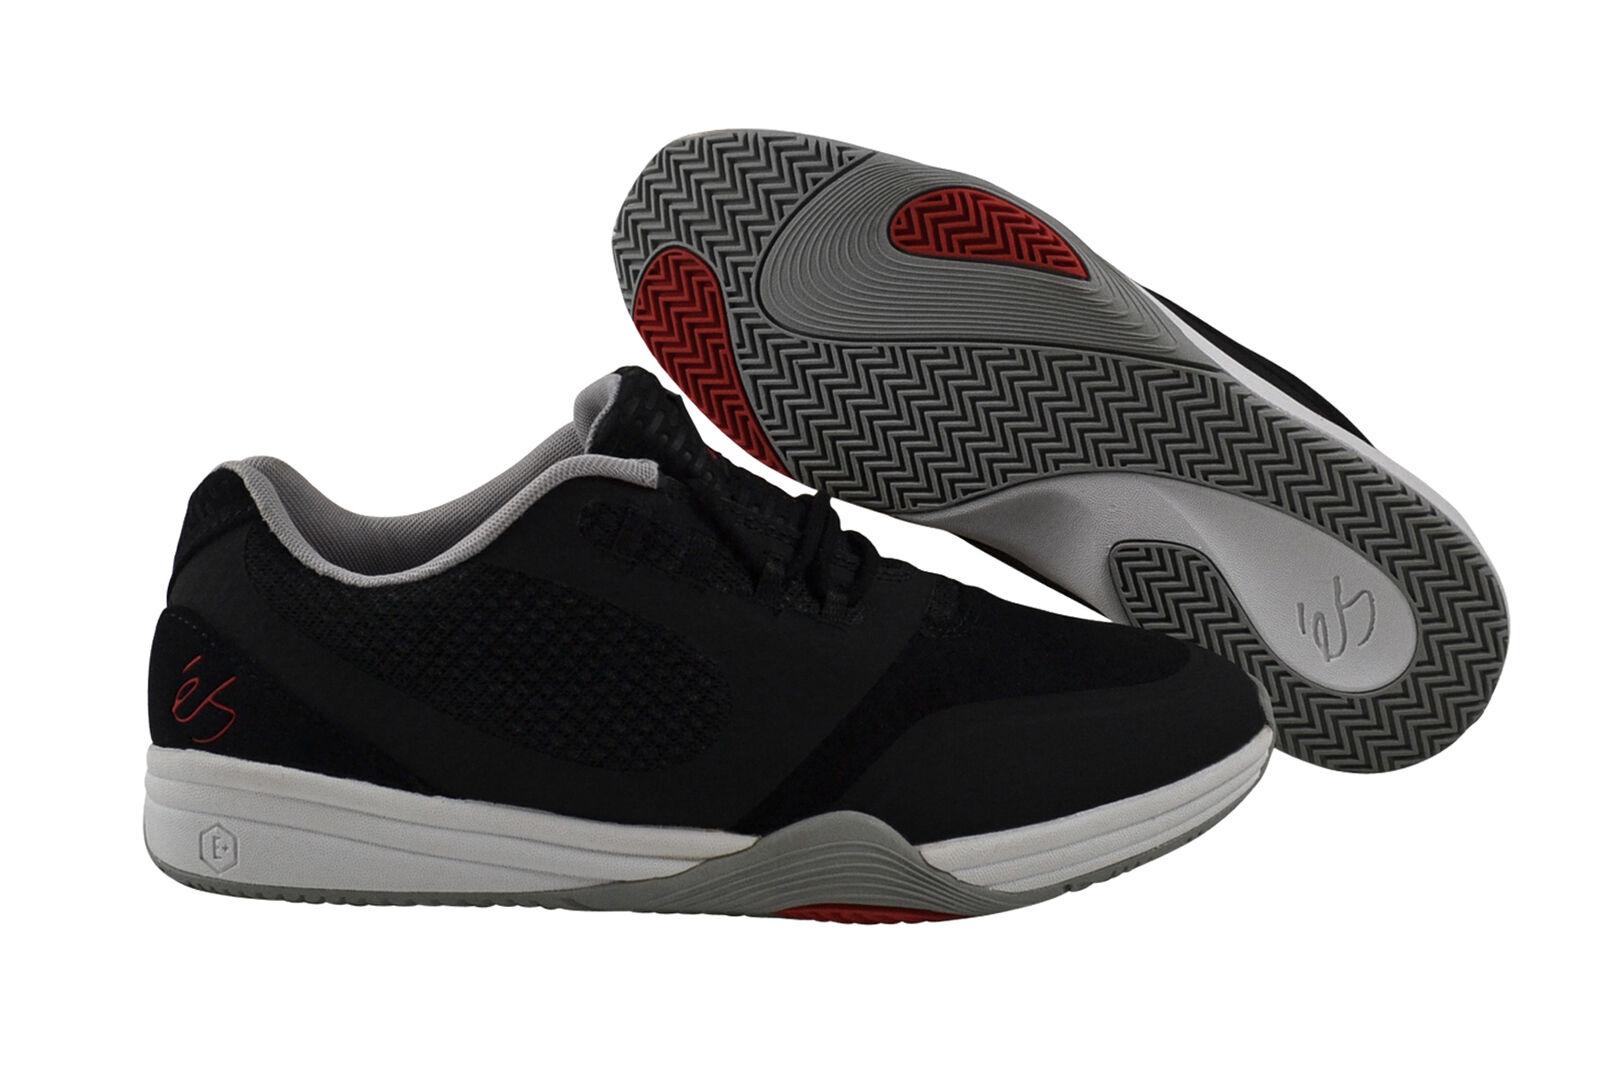 ES Sesla schwarz Grau ROT 576 Sneaker Schuhe schwarz 5101000055 576 ROT 054e63